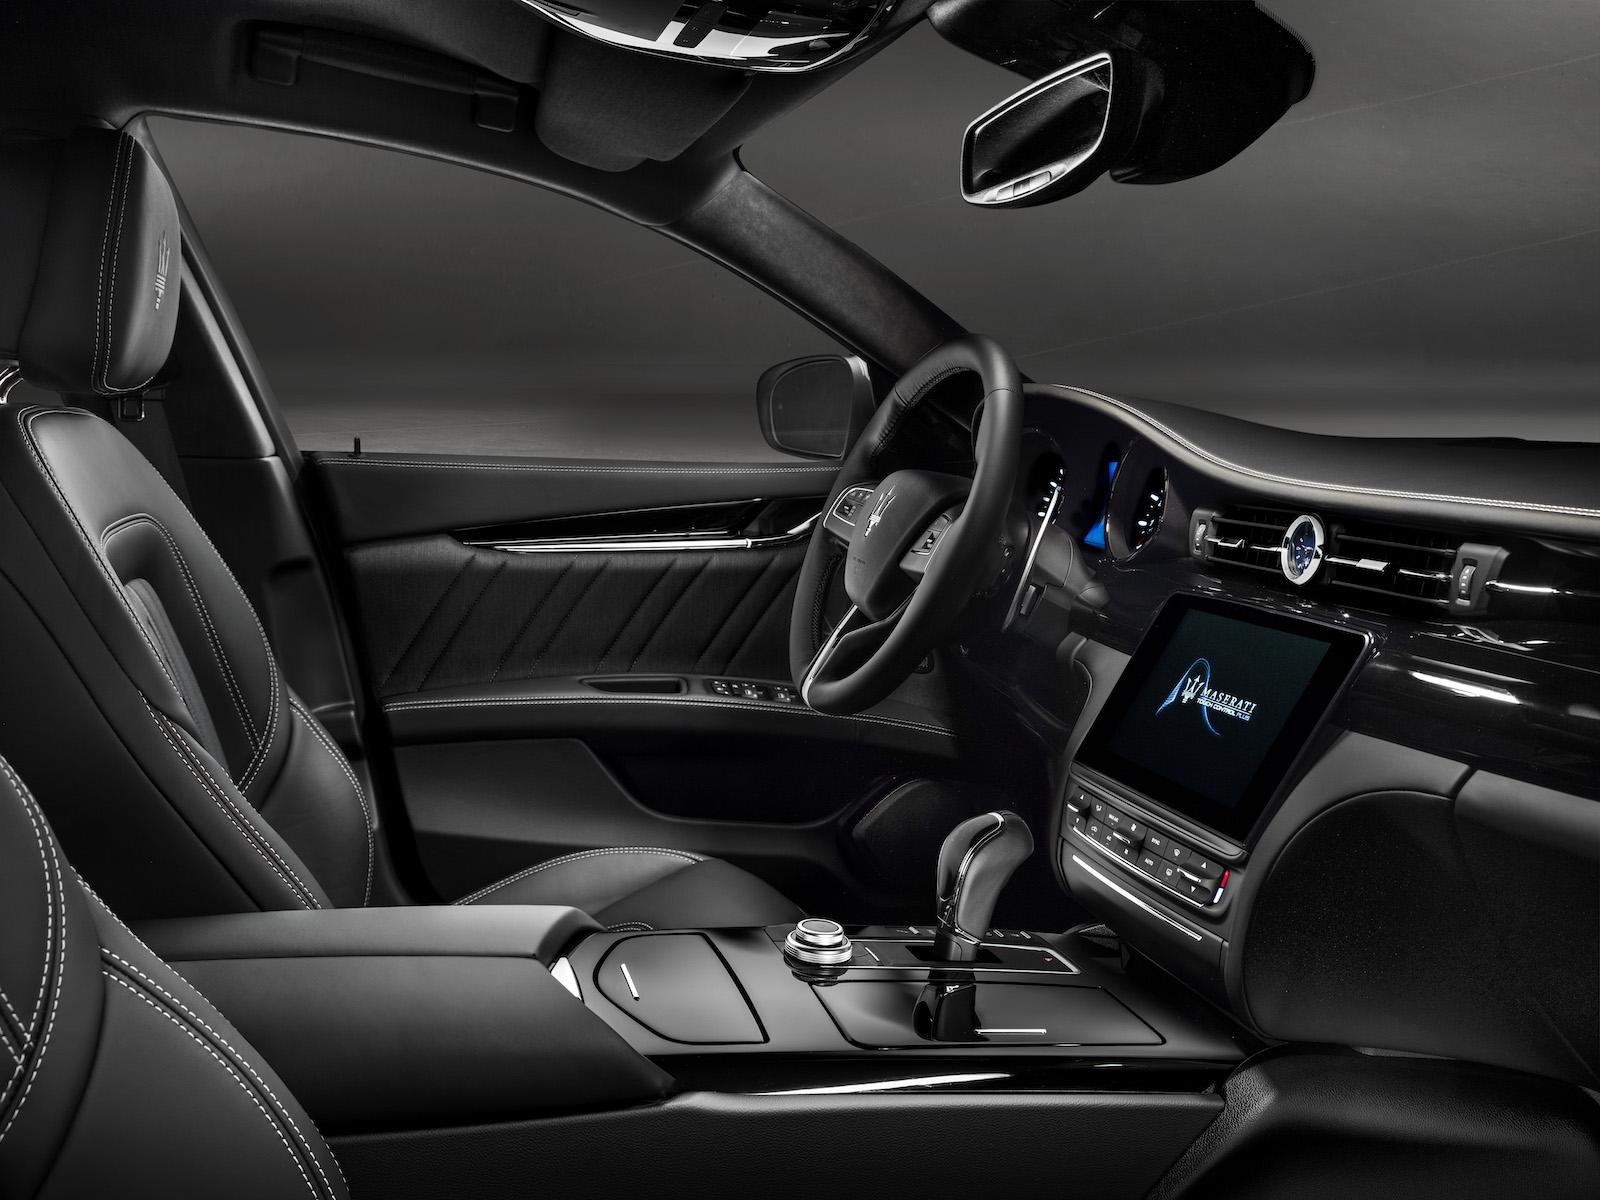 2018 Maserati Quattroporte S GranLusso-interior